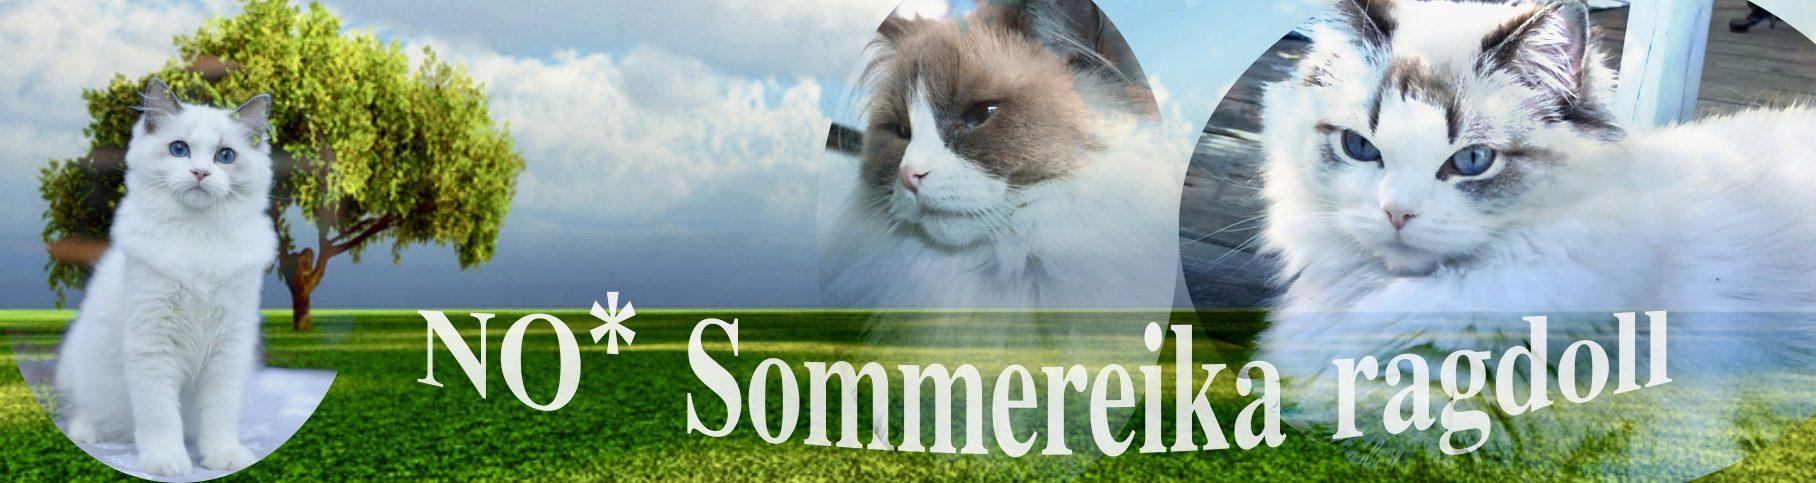 No* Sommereika ragdoll